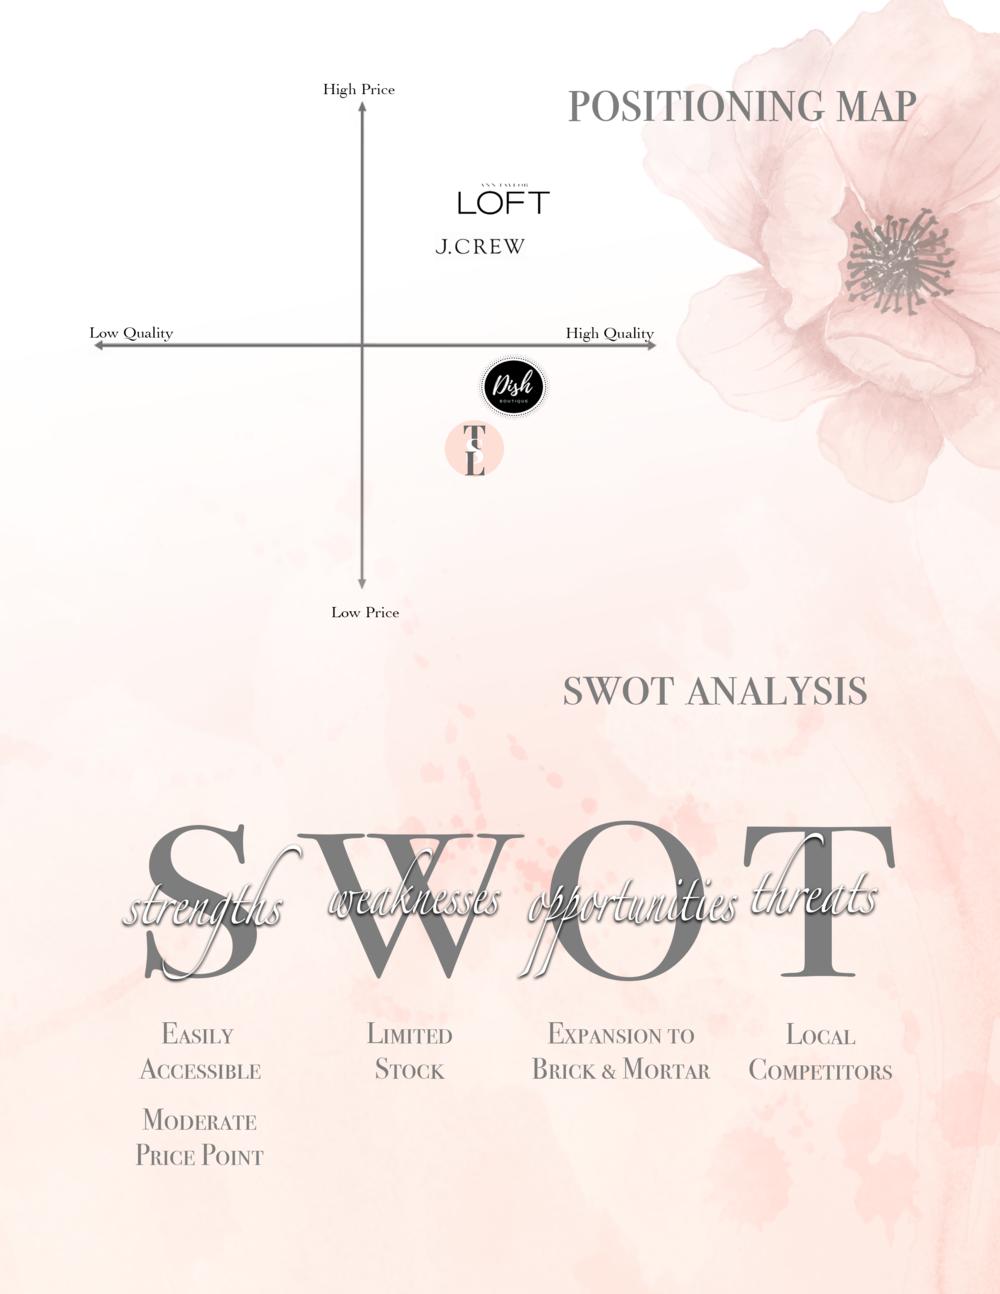 TSL-Positioning Map-SWOT.png